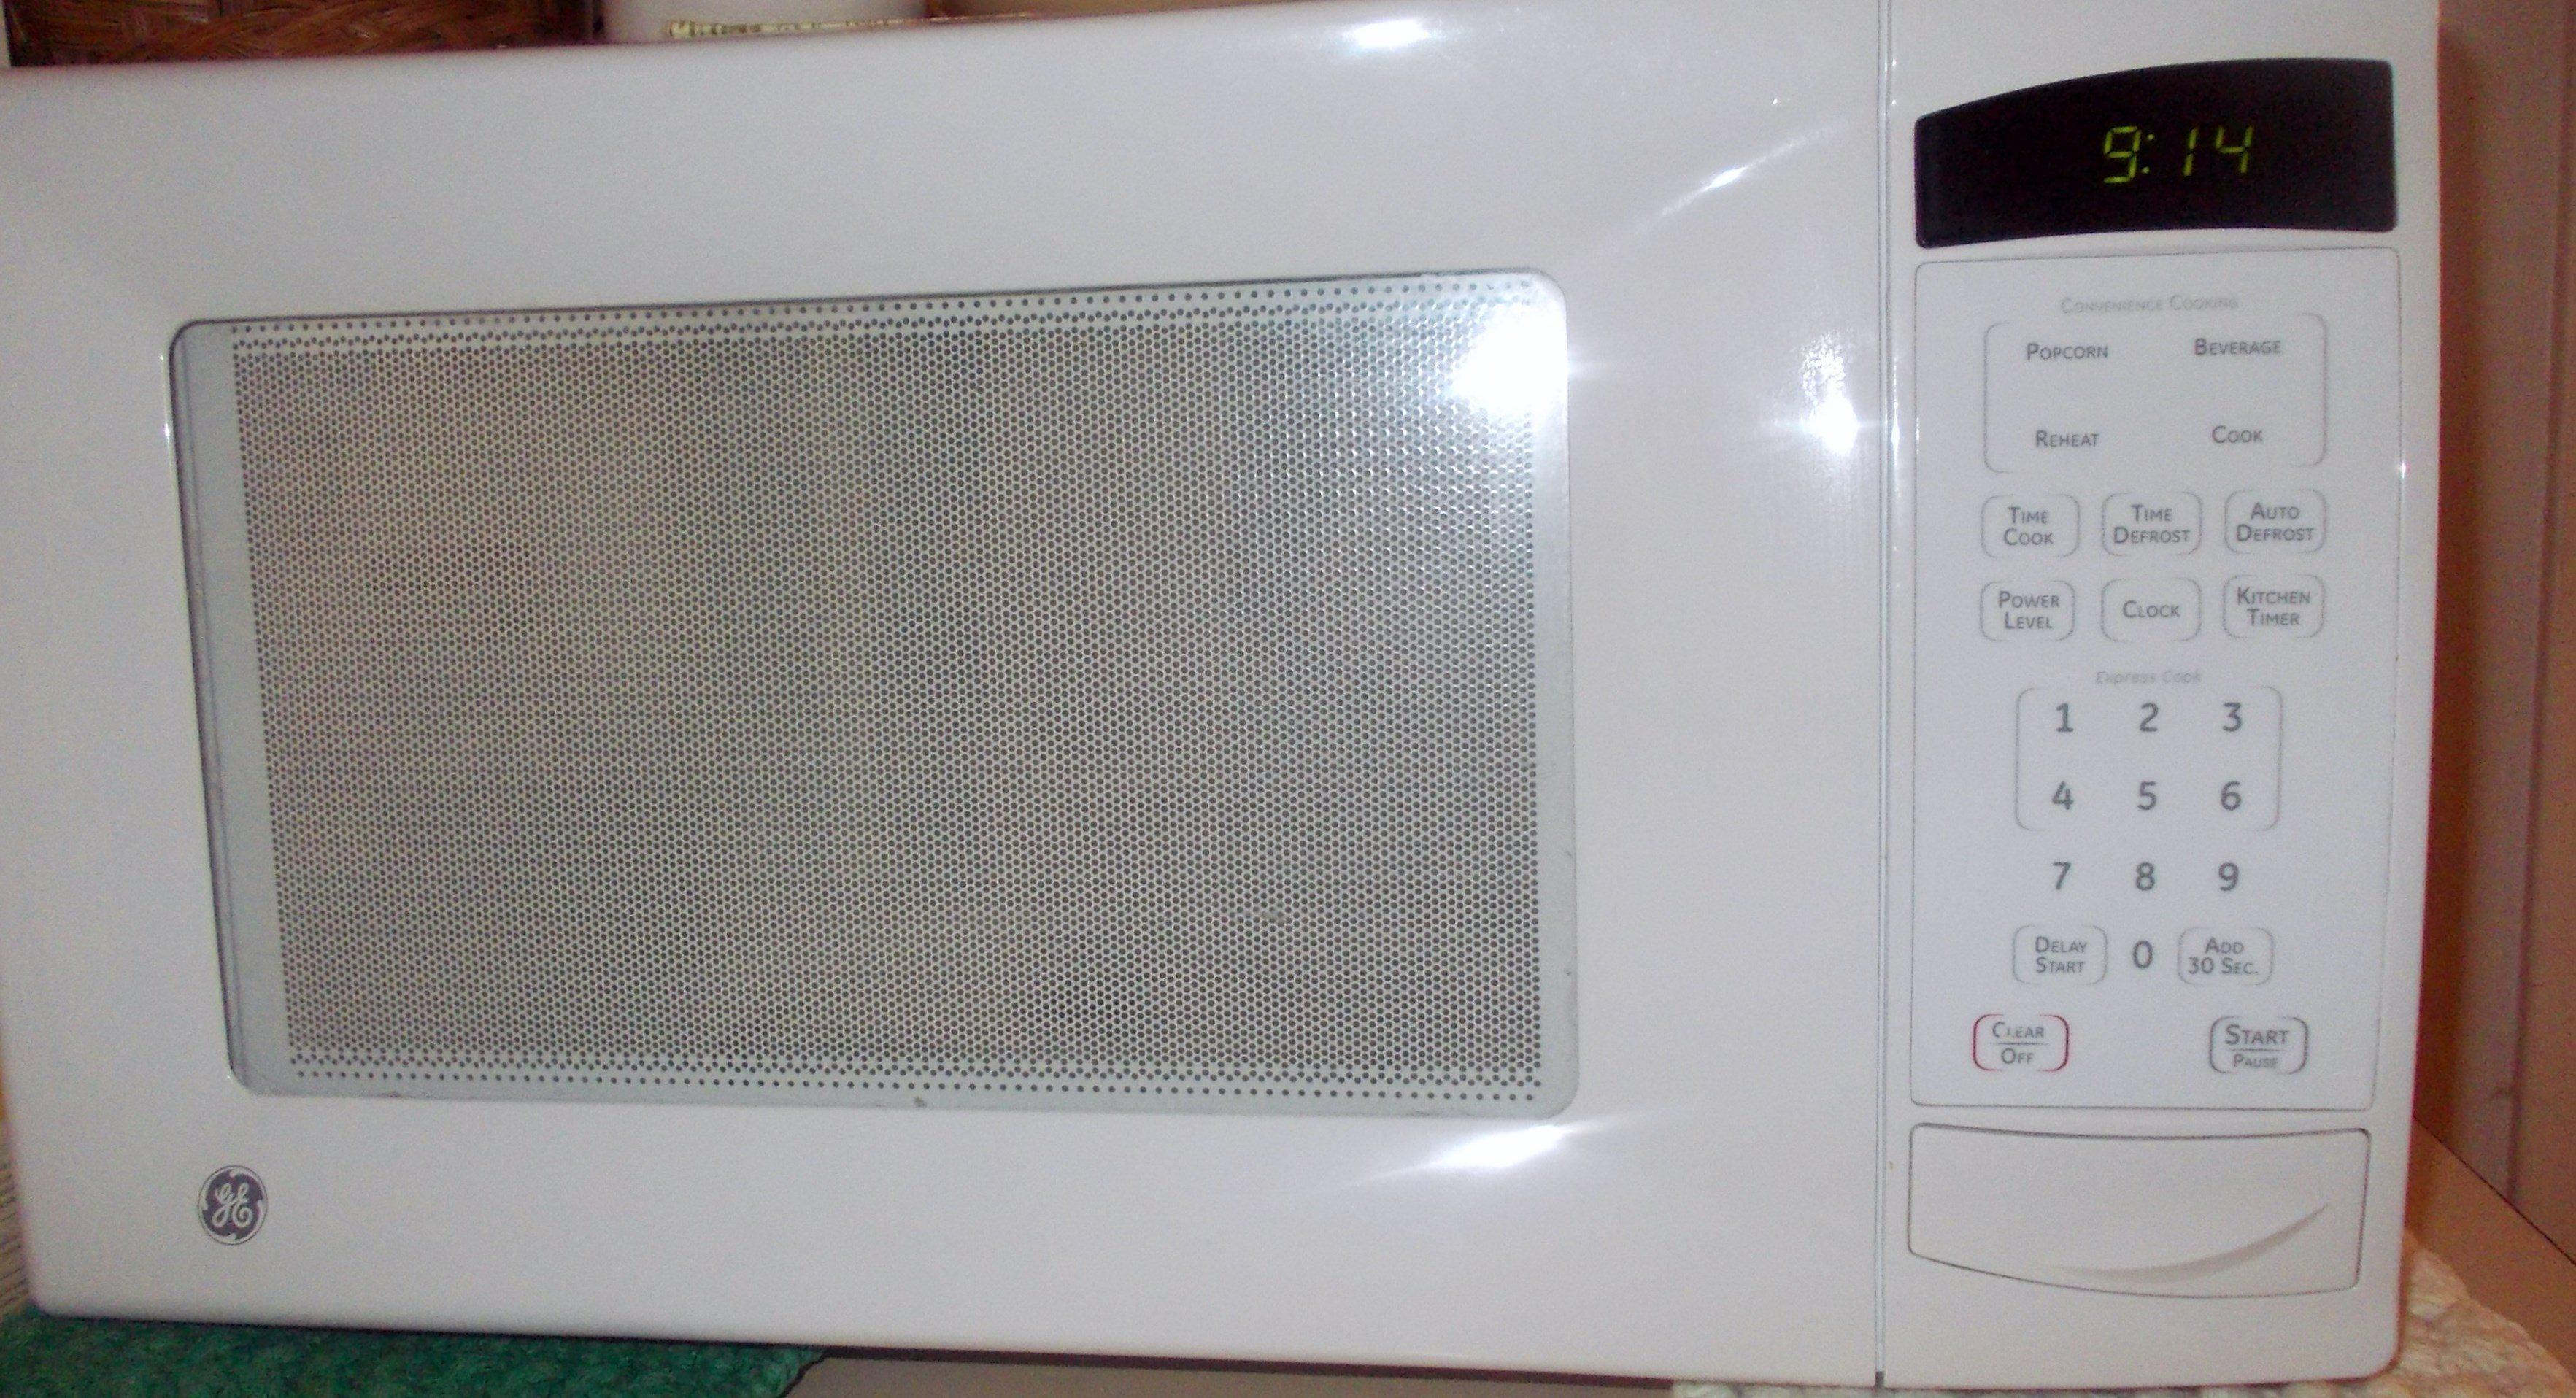 Ge Microwave De68 00307a Bestmicrowave